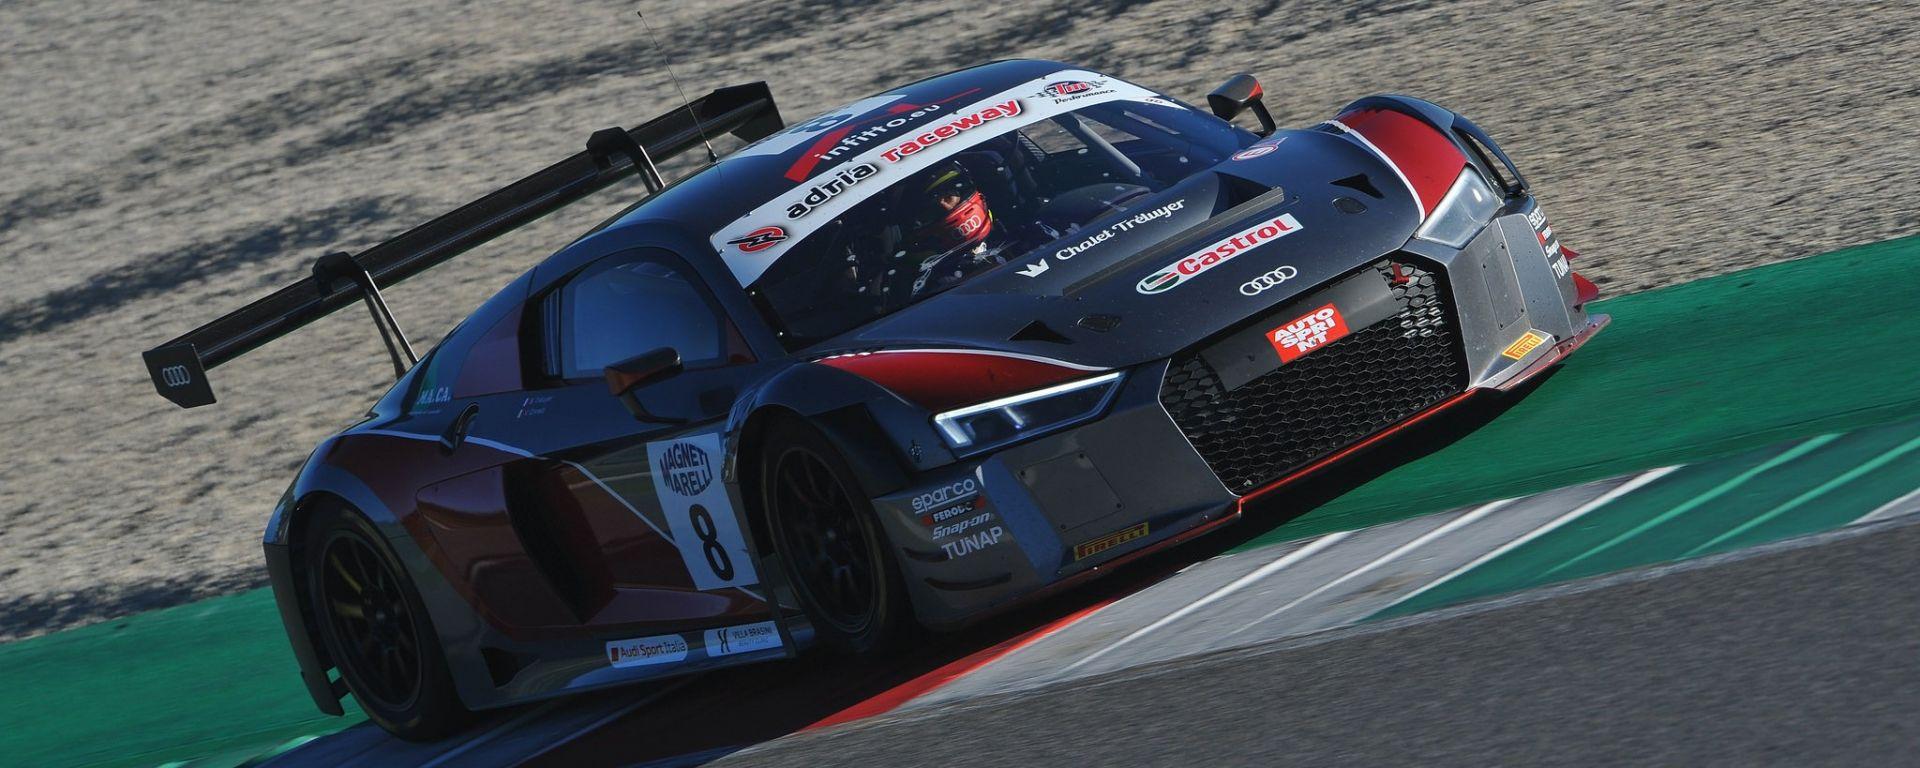 Audi R8 LMS - Campionato GT Italiano 2017